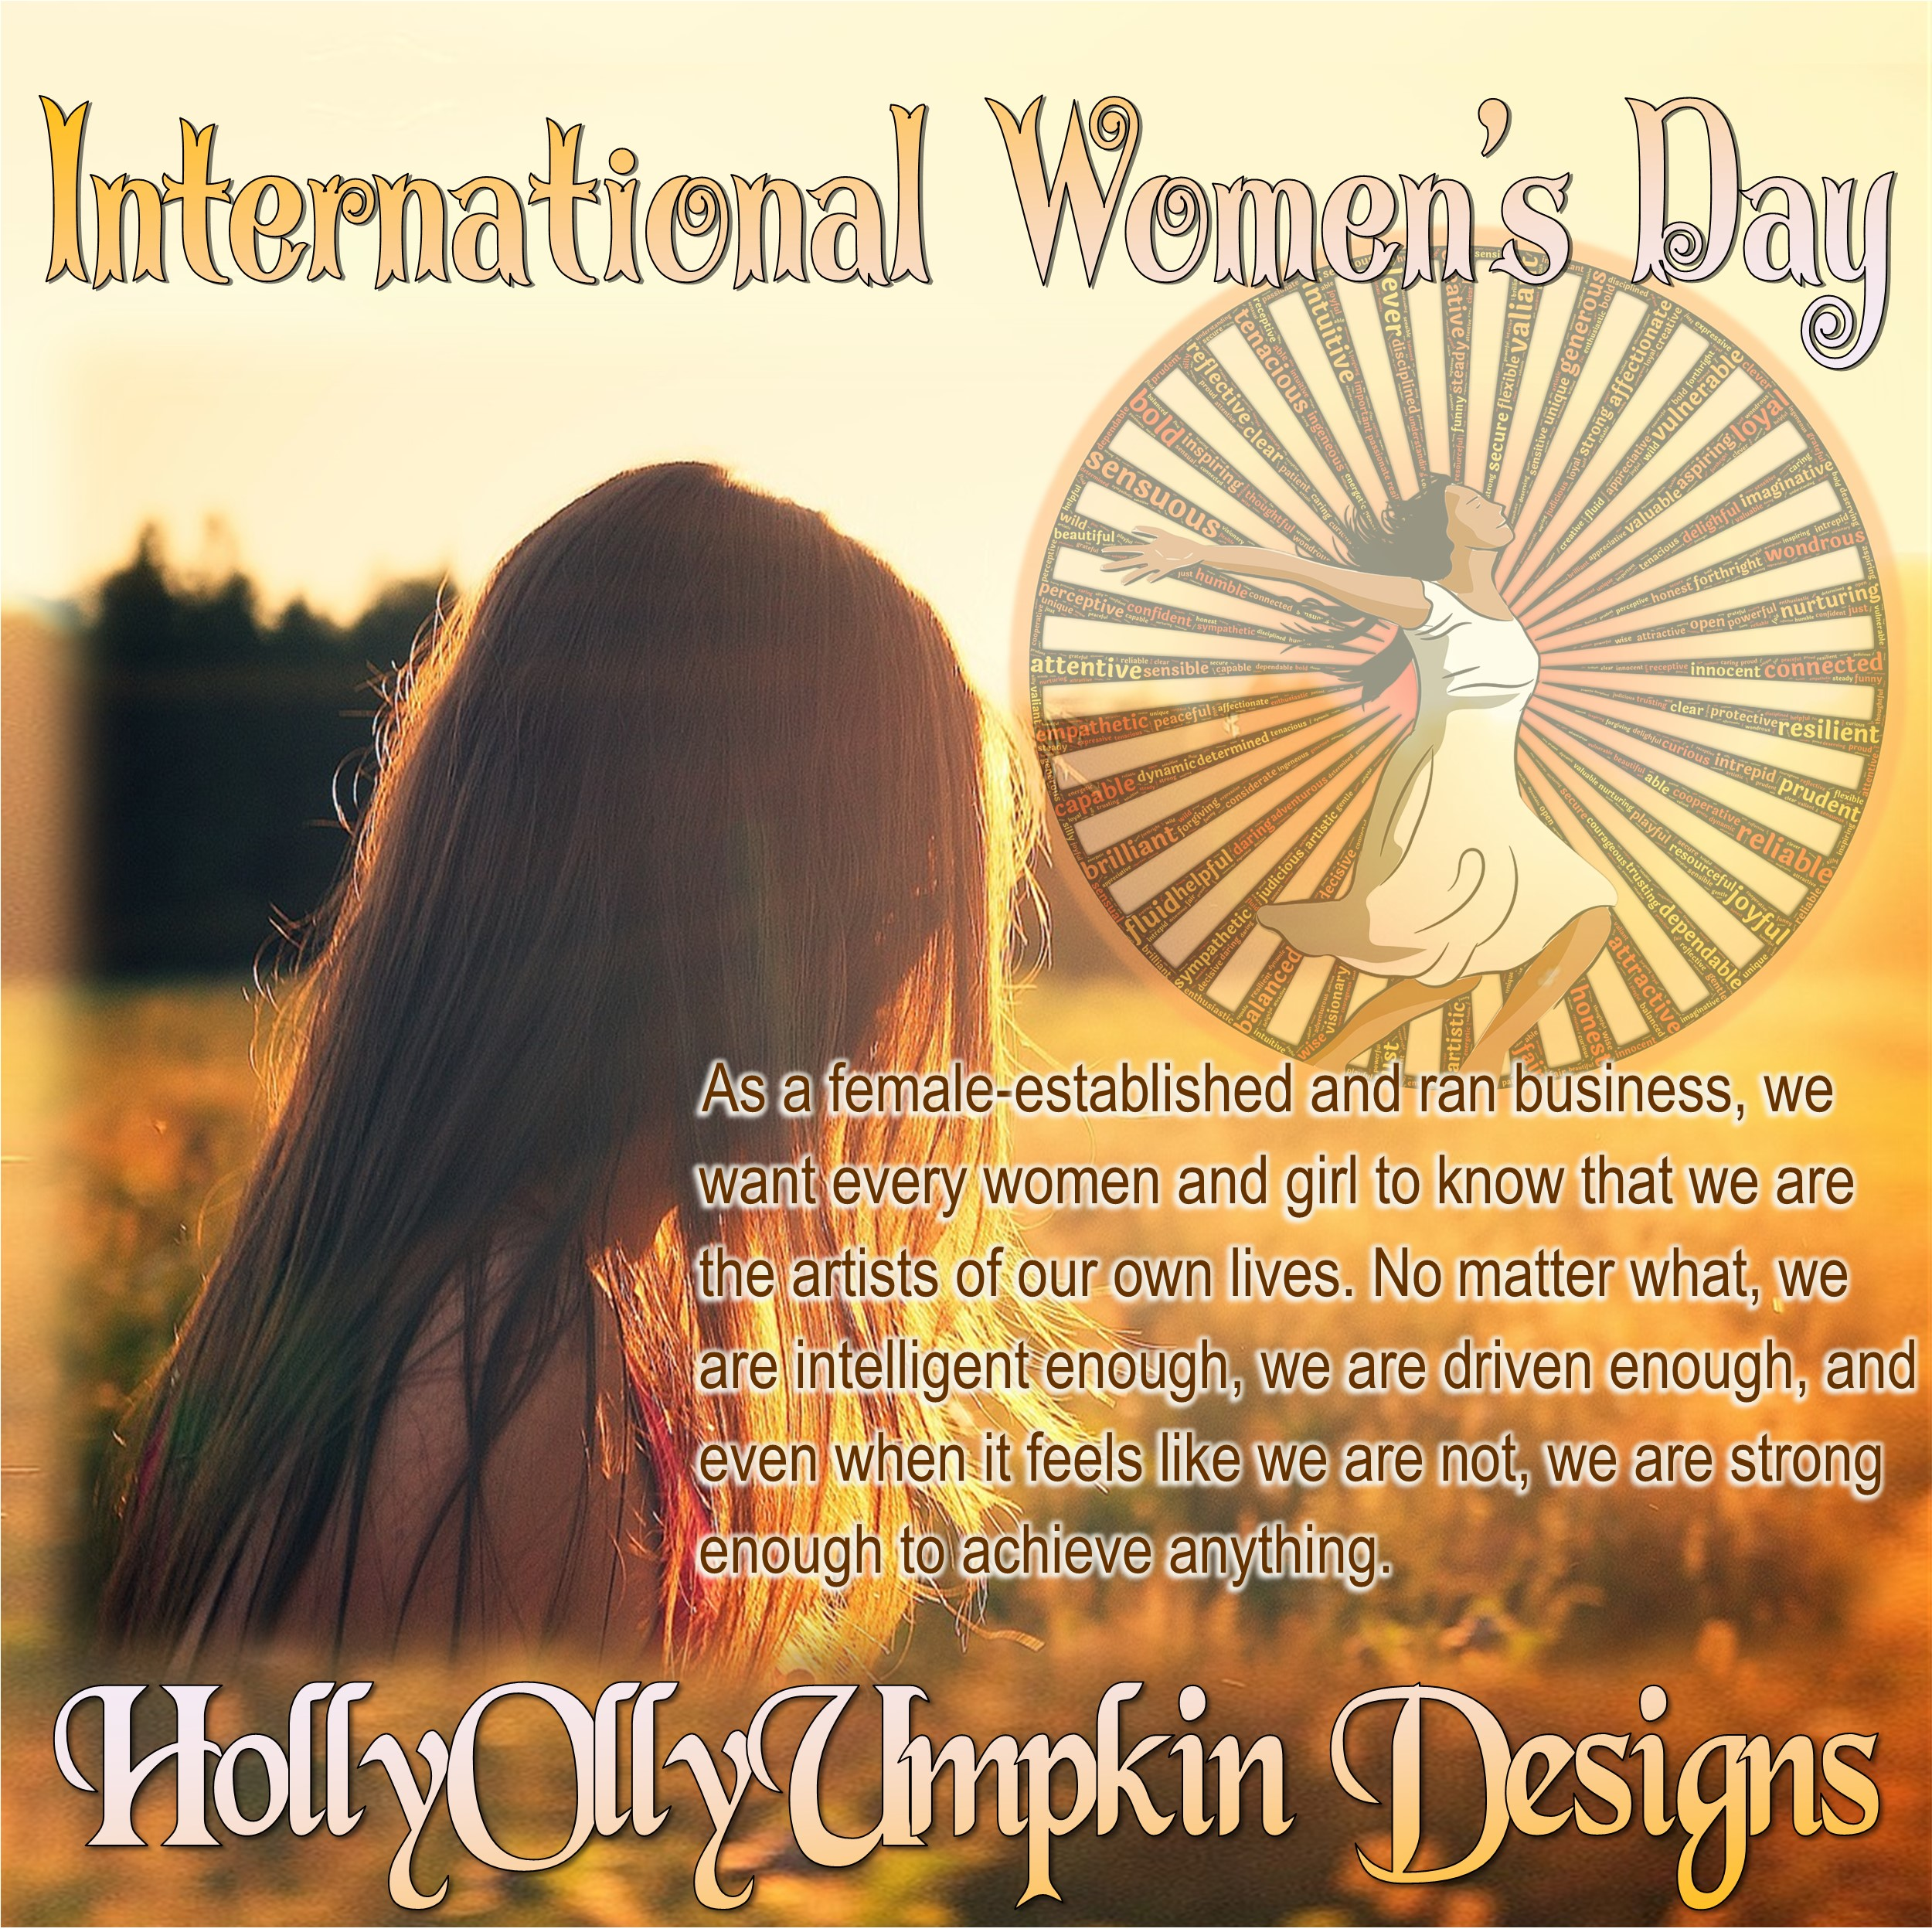 International Women's Day 2021 - Social Media Post